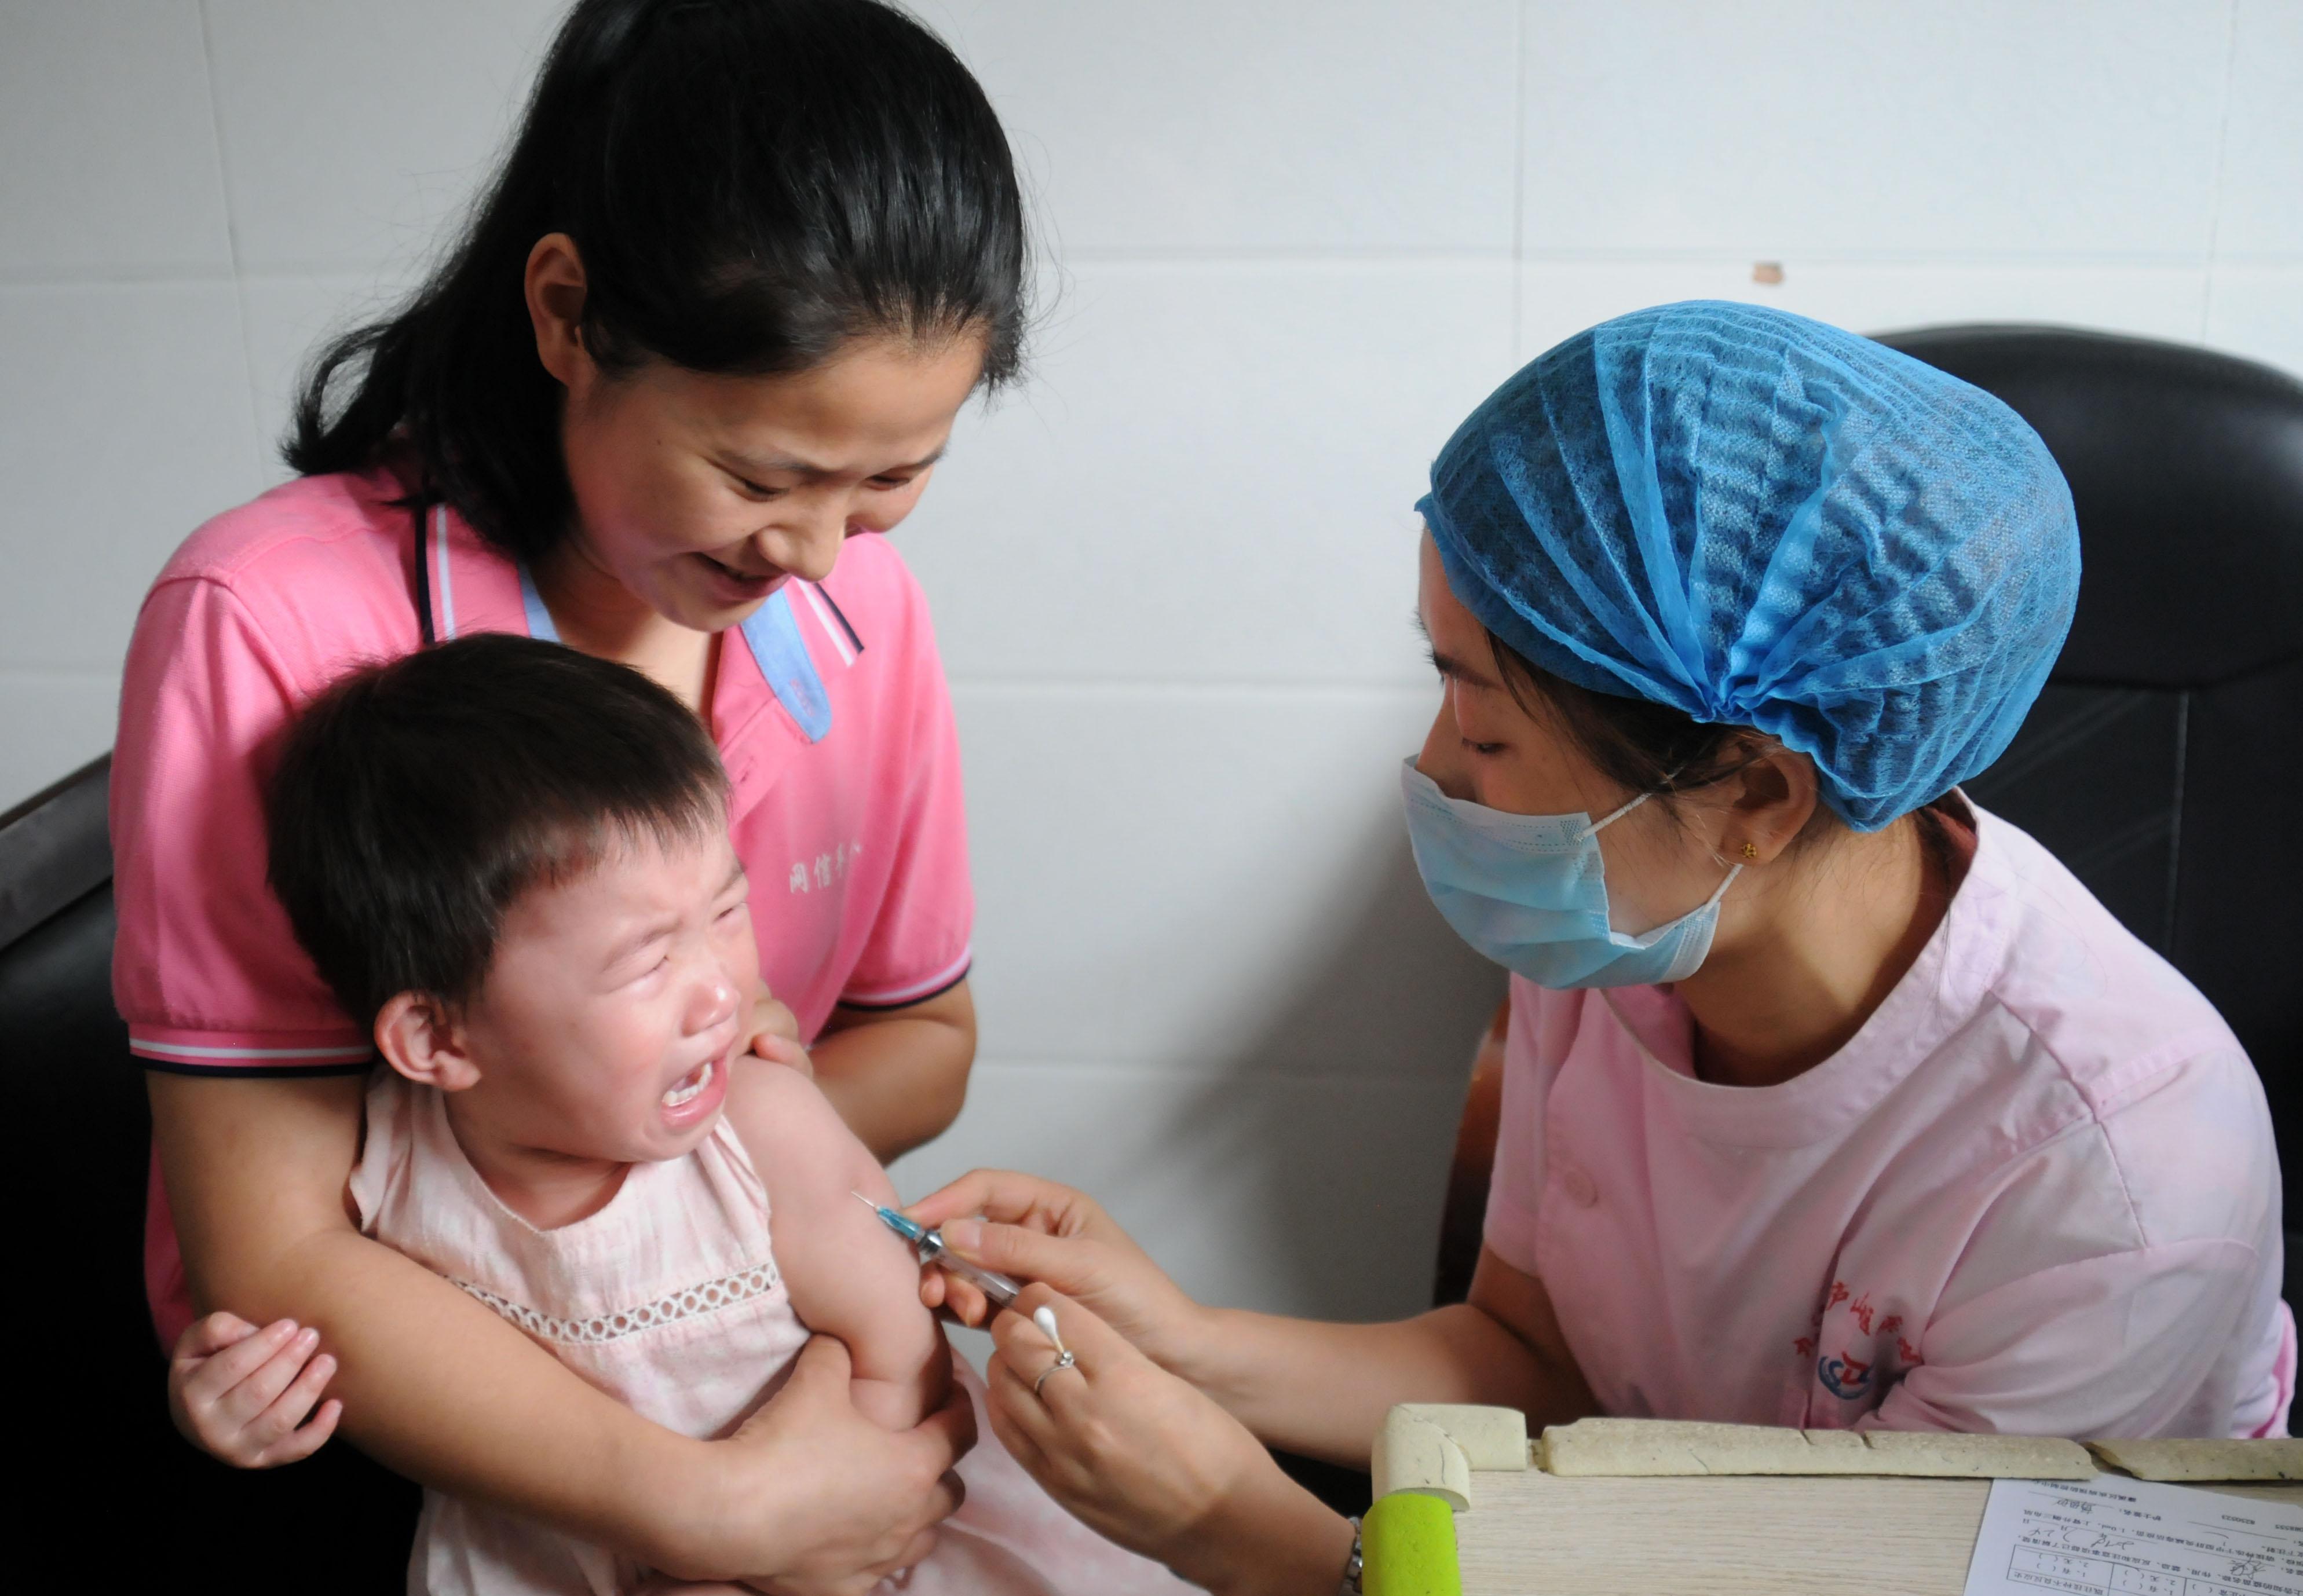 A child receives a vaccination on July 24, 2018 in Jiujiang, Jiangxi Province. China.